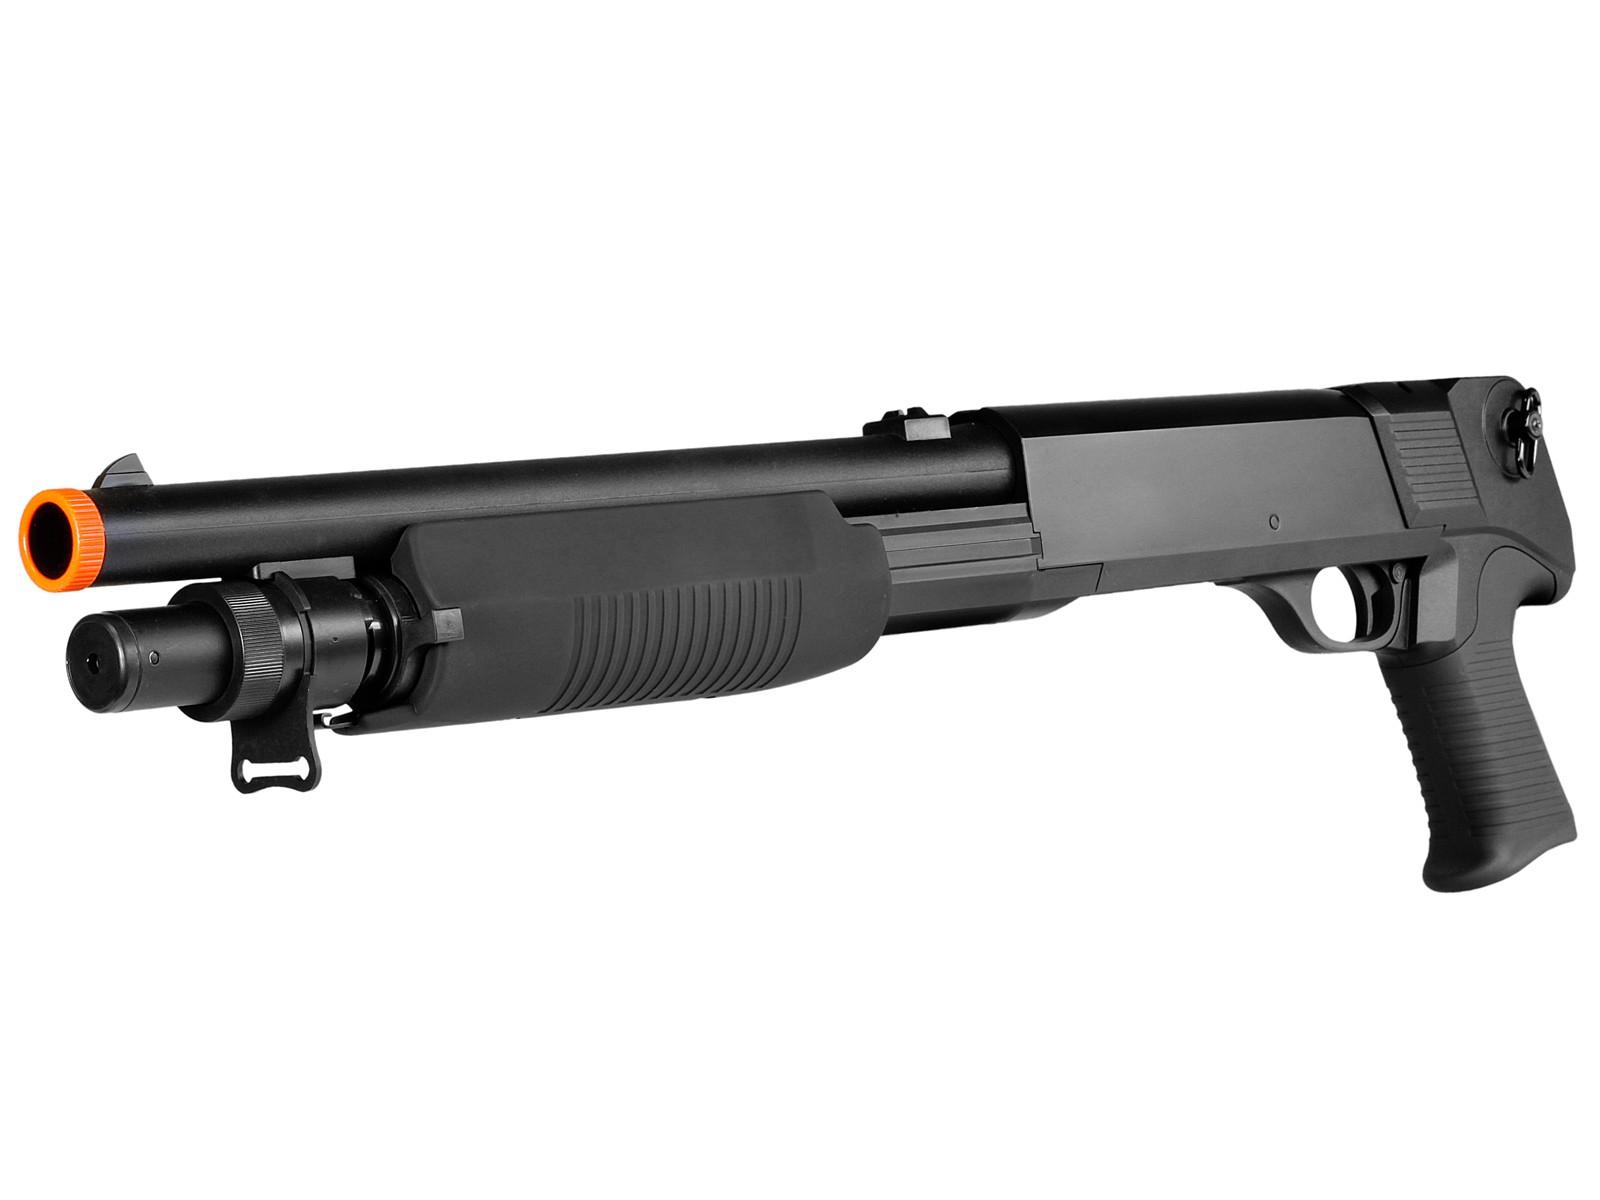 MultiShot_Combat_Commando_Shotgun_6mm